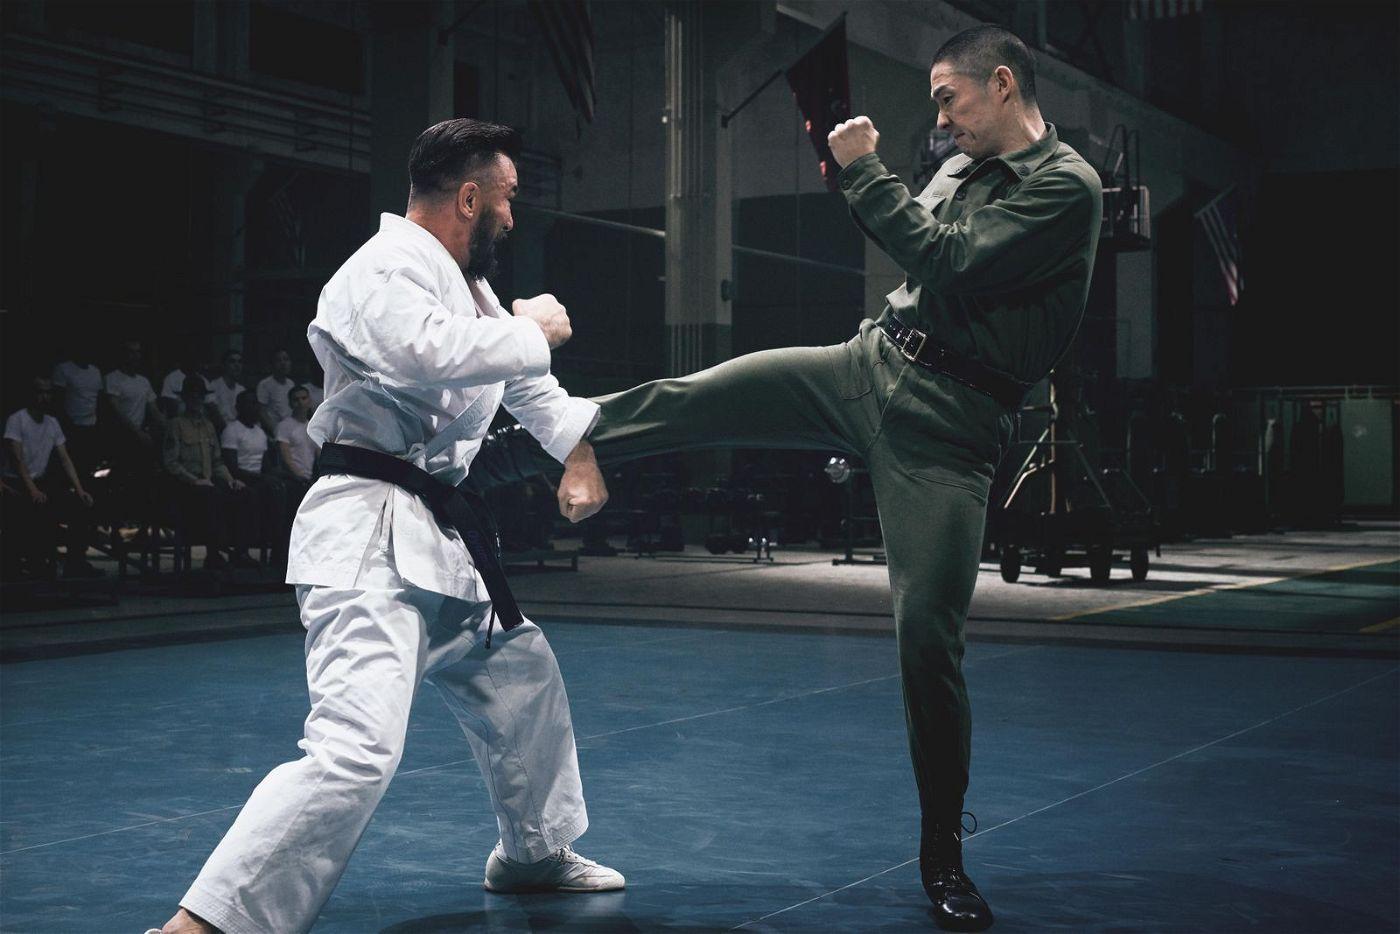 Japanische gegen chinesische Kampfkunst: Der US-Marine Colin Frater (Chris Collins, links) legt sich mit Bruce Lees Schüler Hartman Wu (Vanness Wu) an.